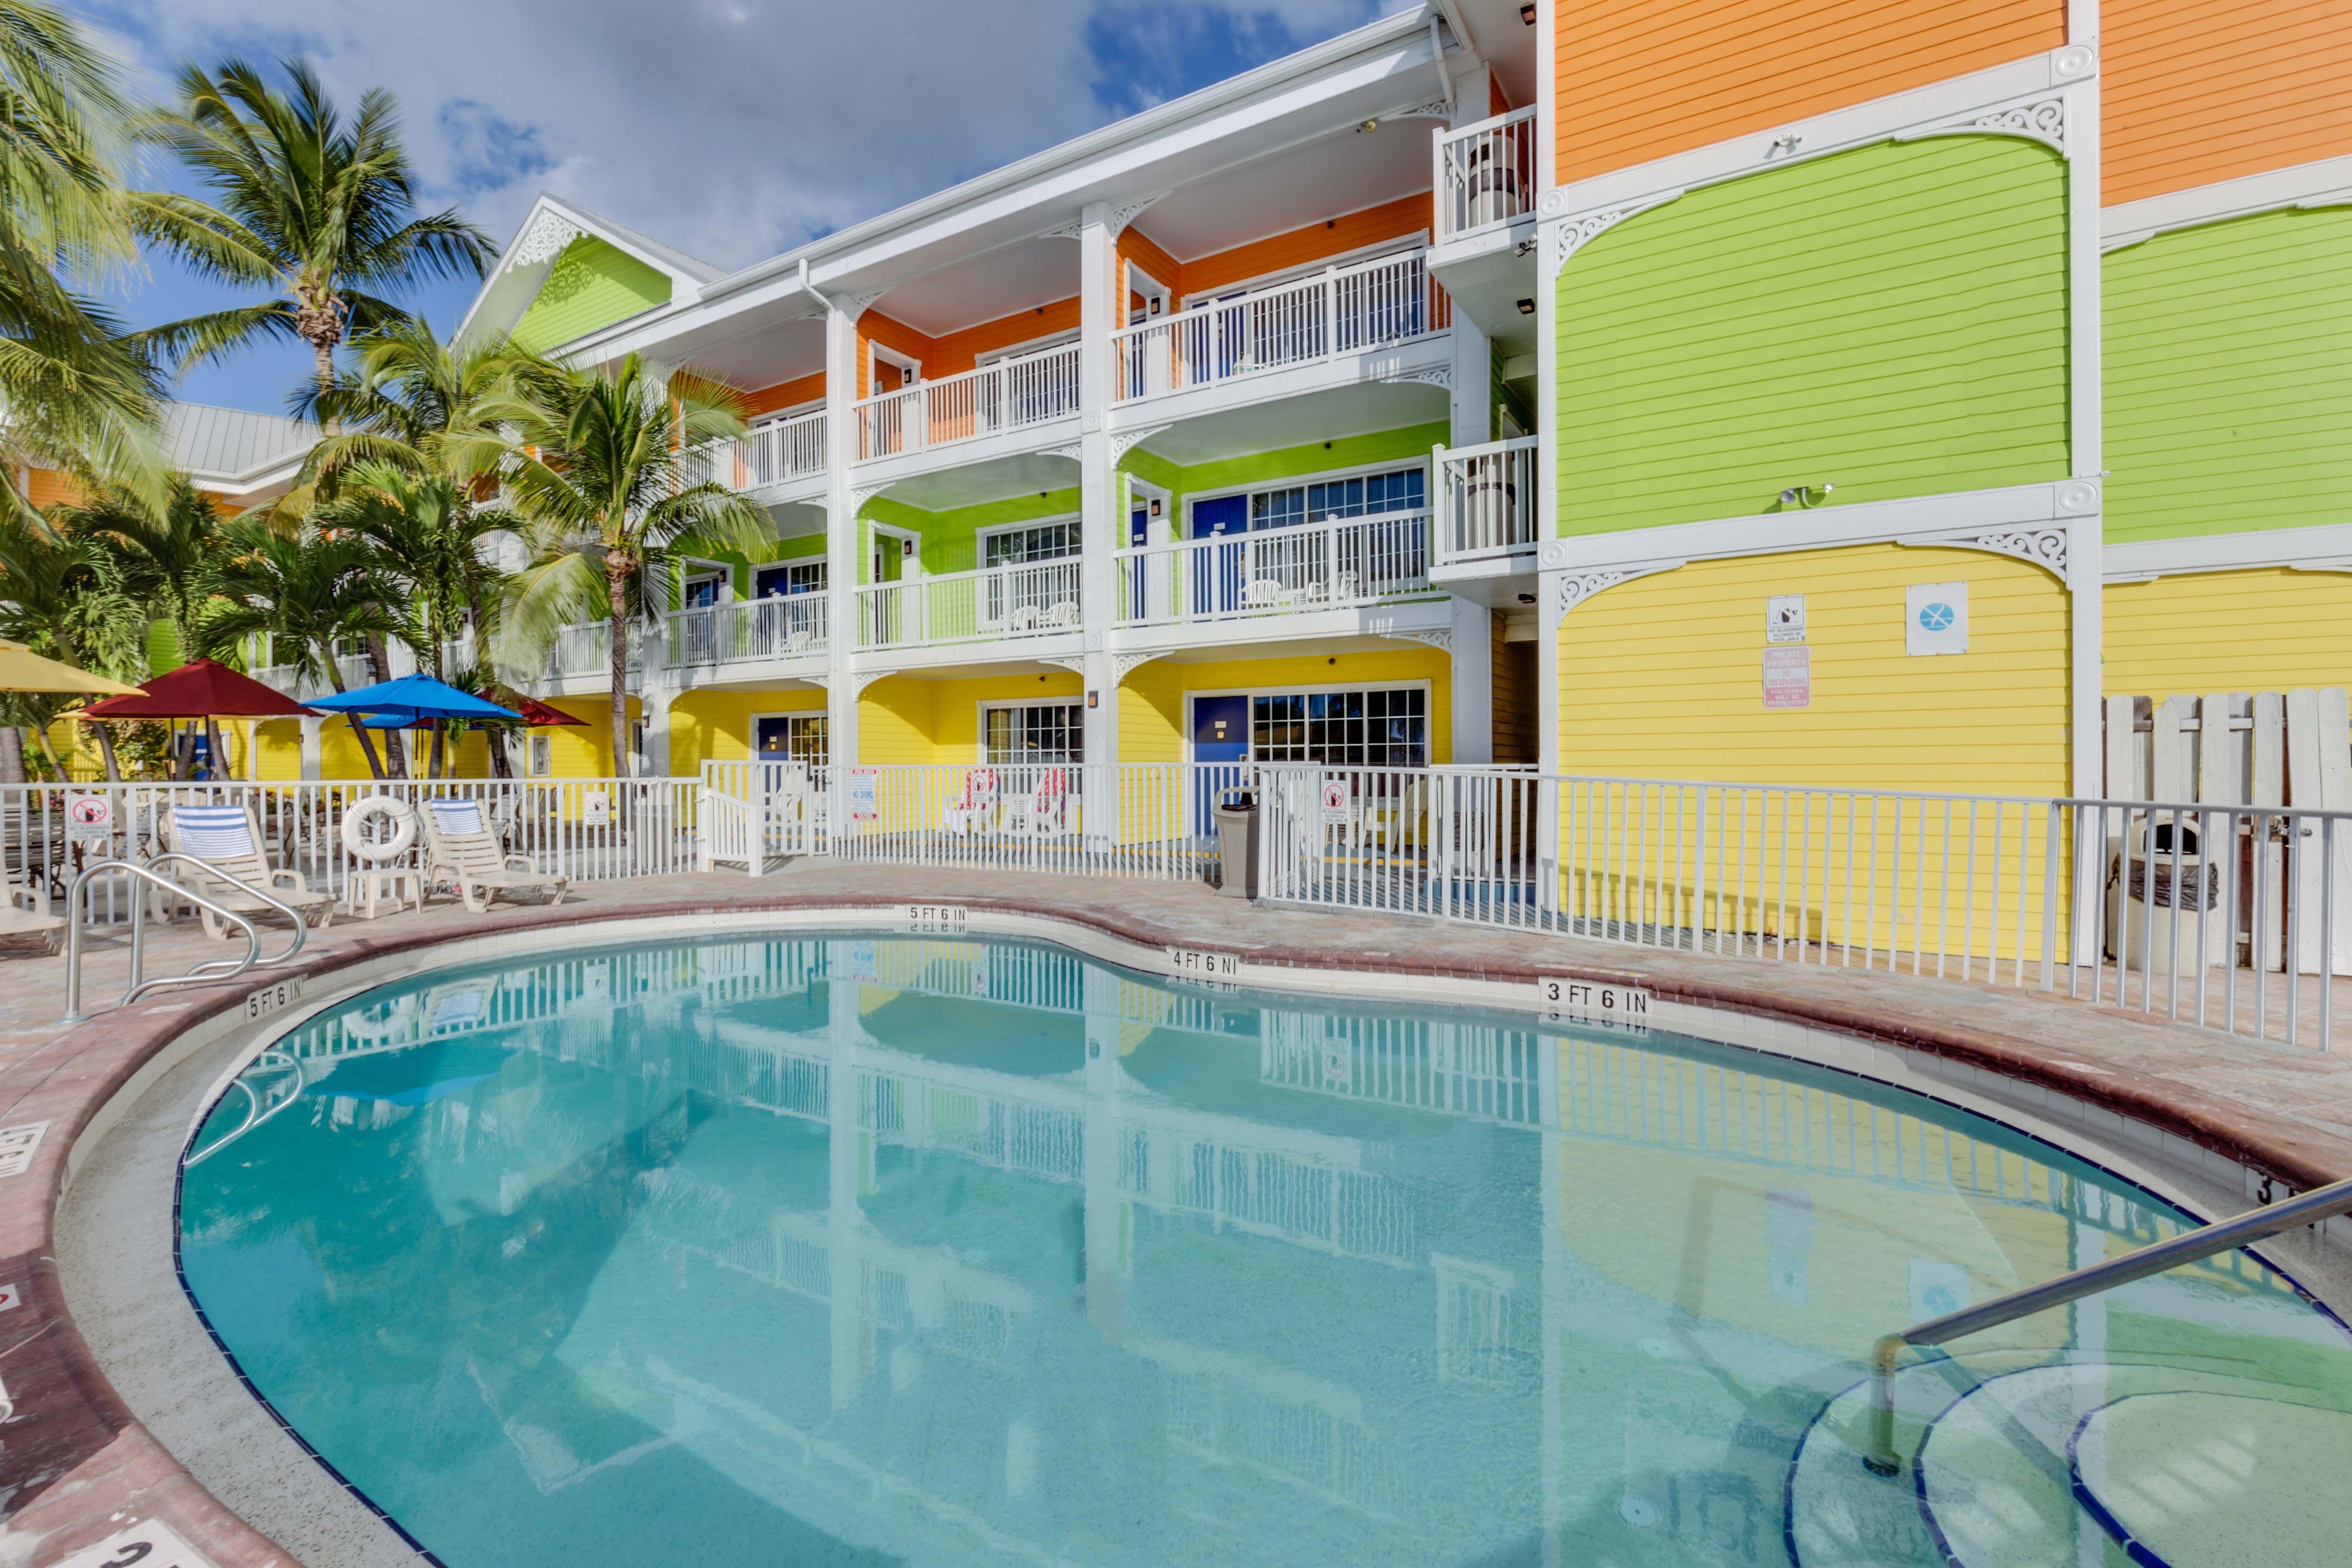 Fort Myers Beach Location - TPI Hospitality